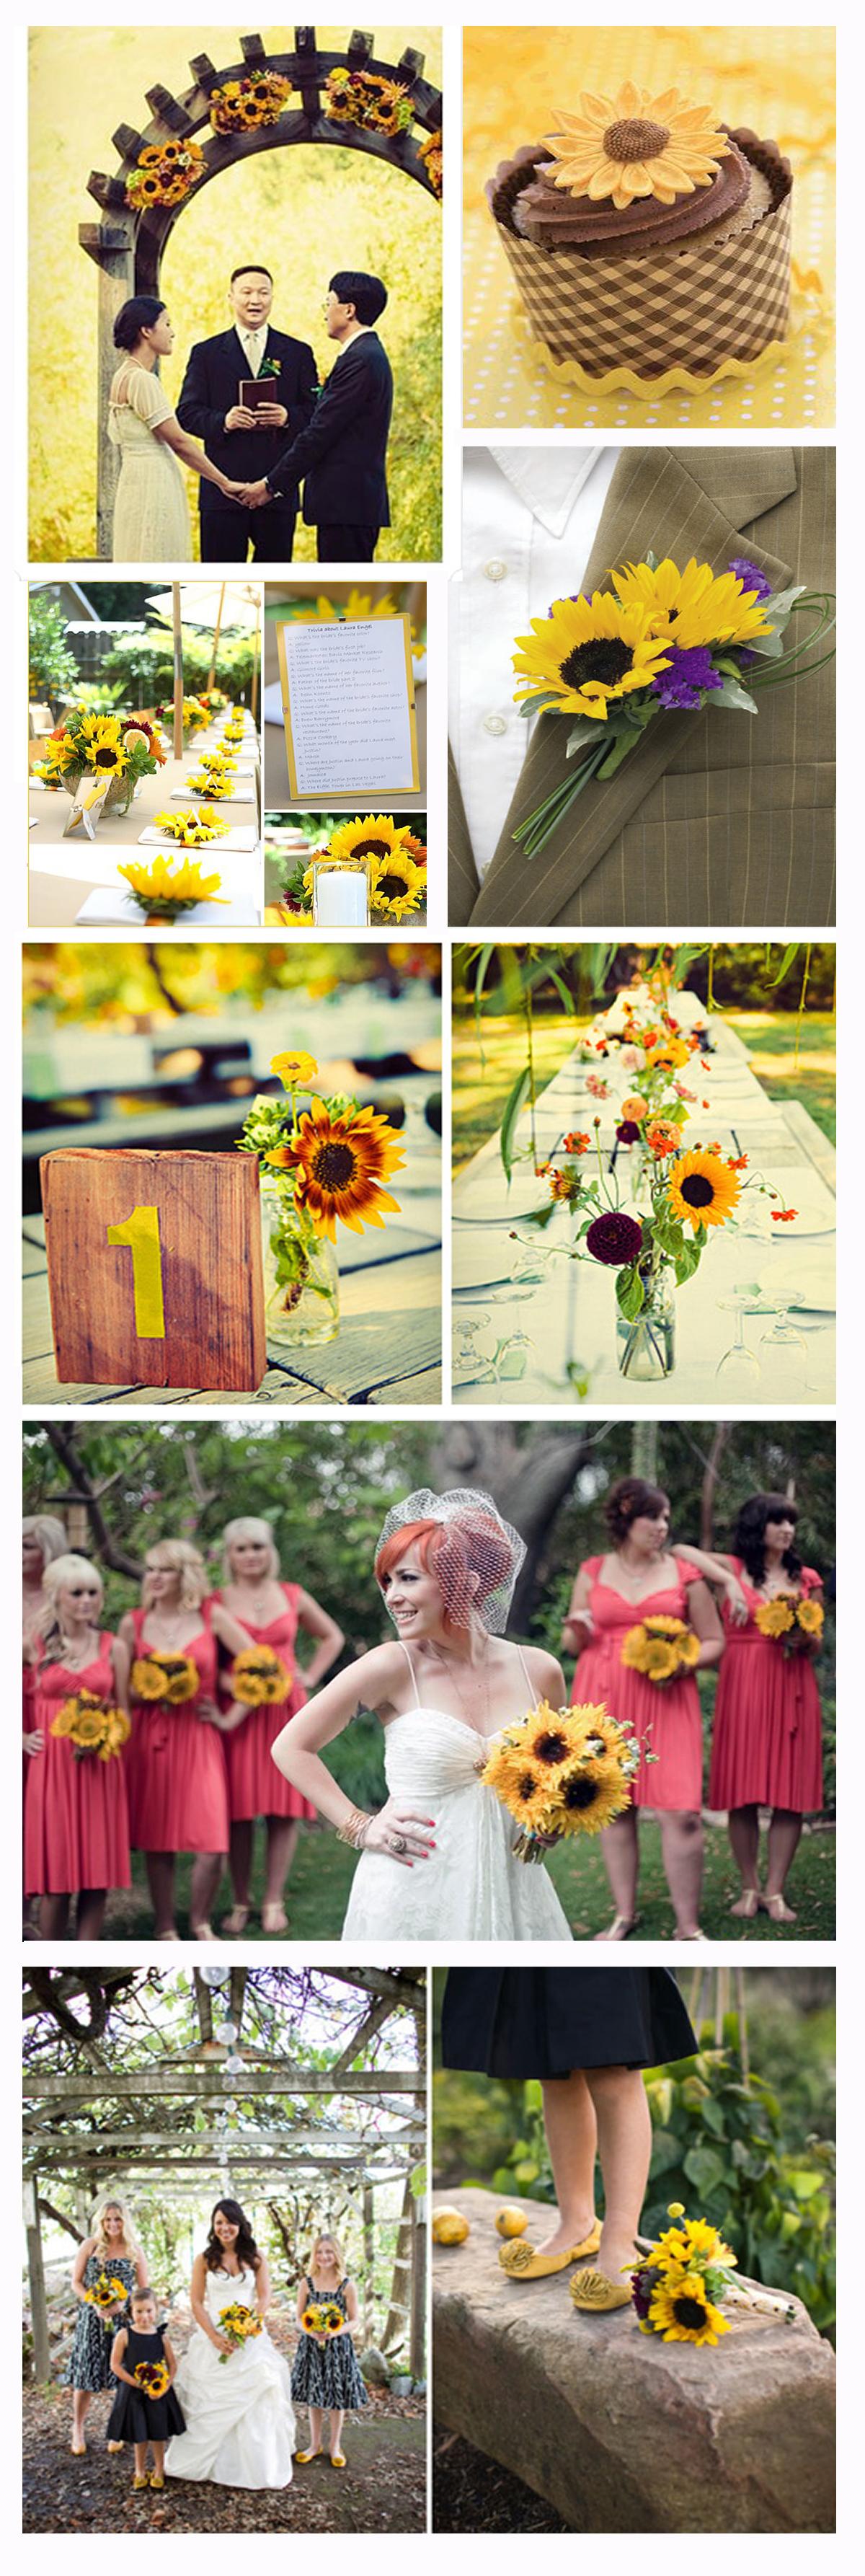 Sunflower Wedding Theme Sunflower Wedding Inspirations Pinterest